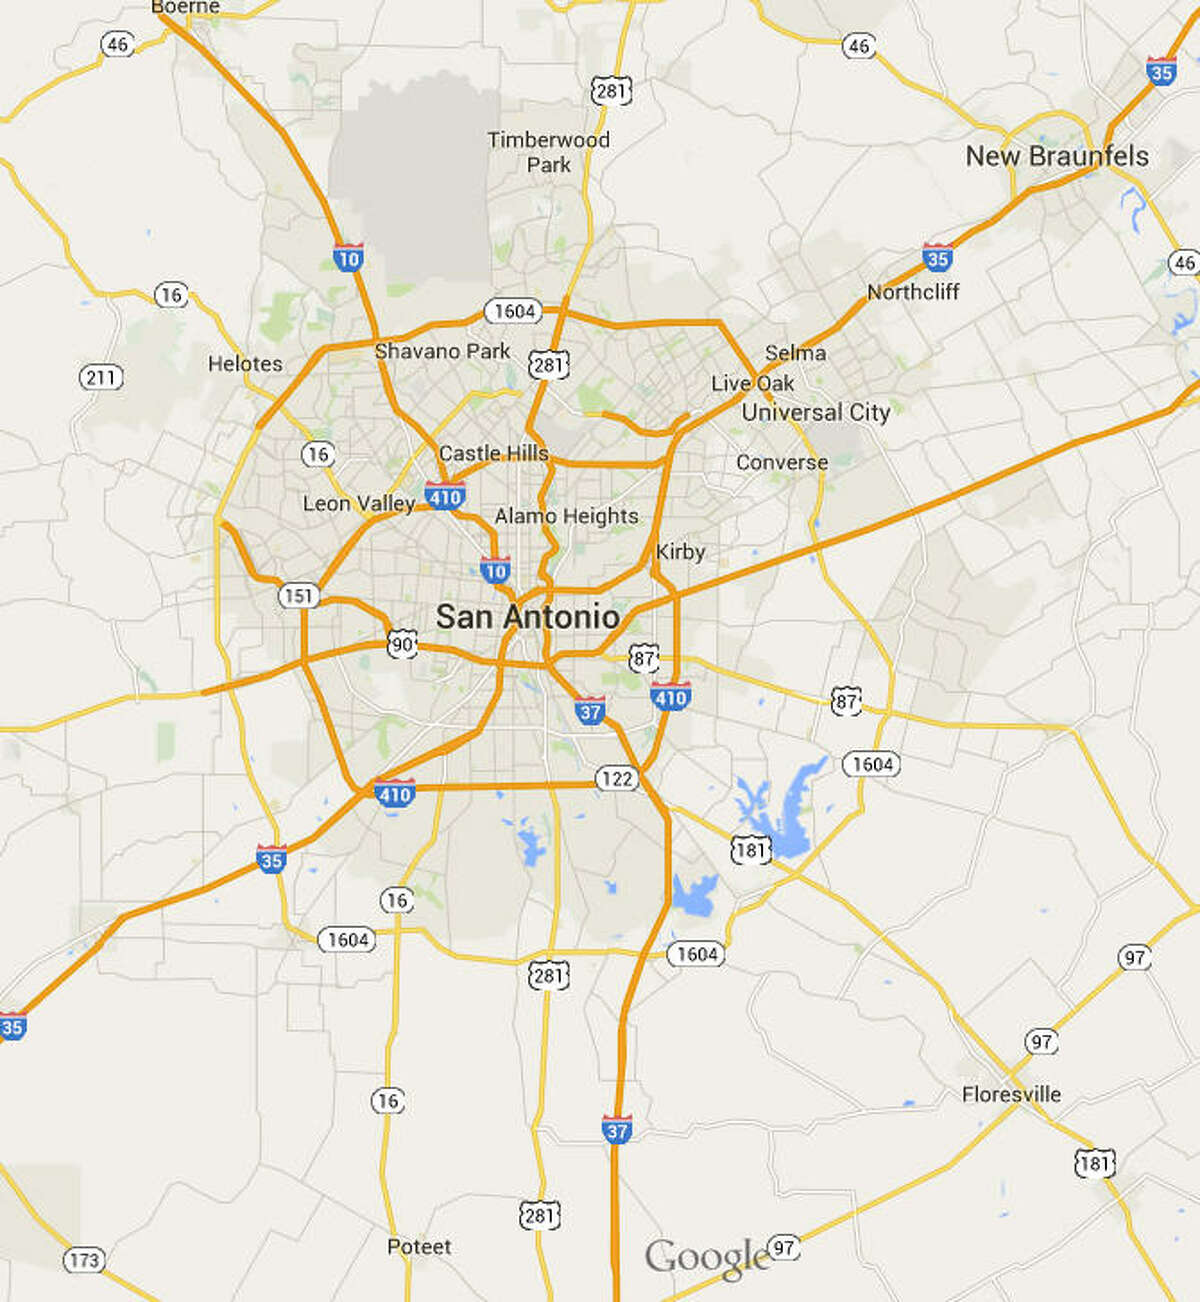 San Antonio Population: 1.4 million From Google Maps